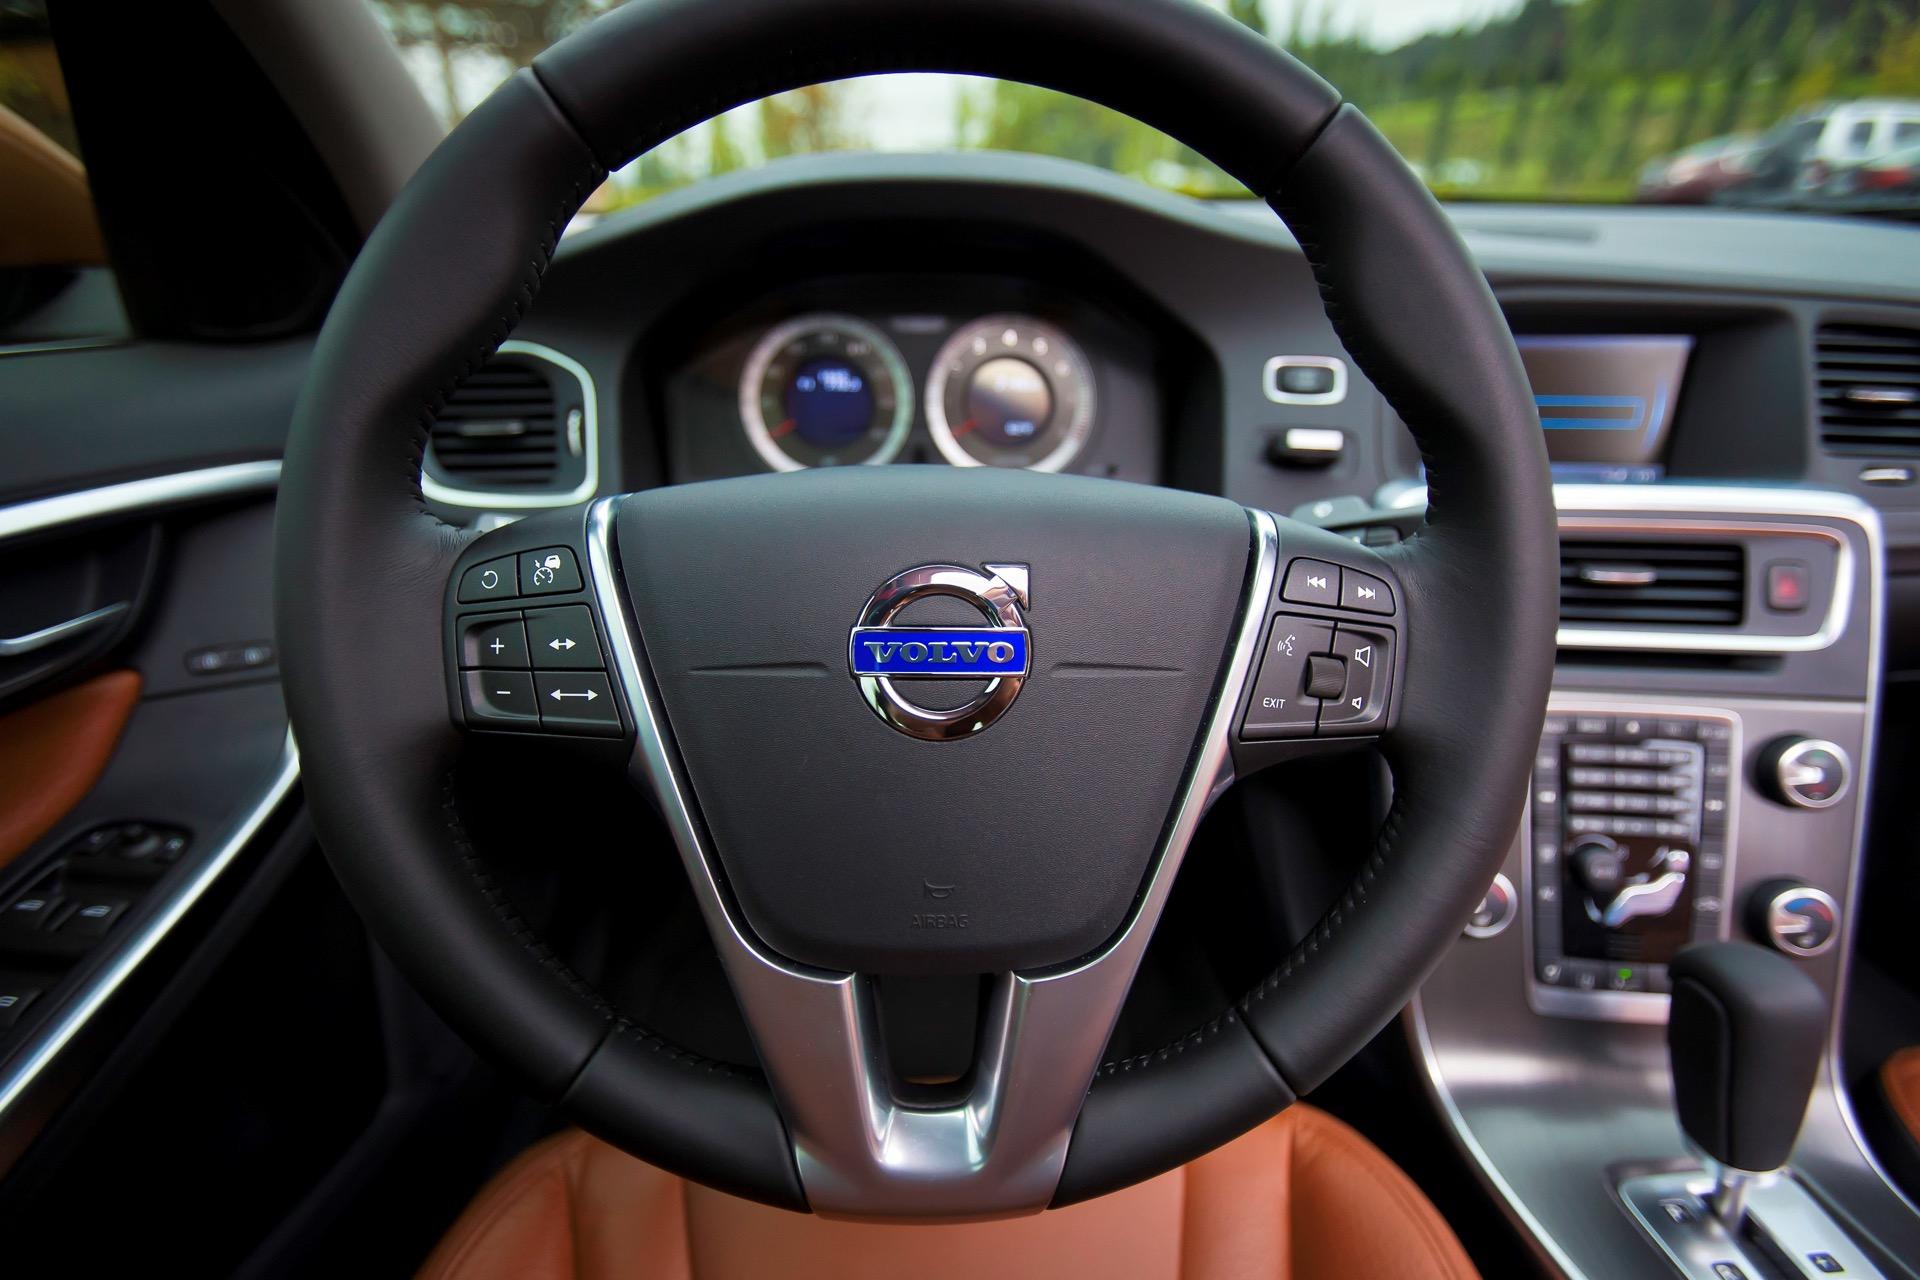 S60 T6 Awd Interior04 -  Volvo